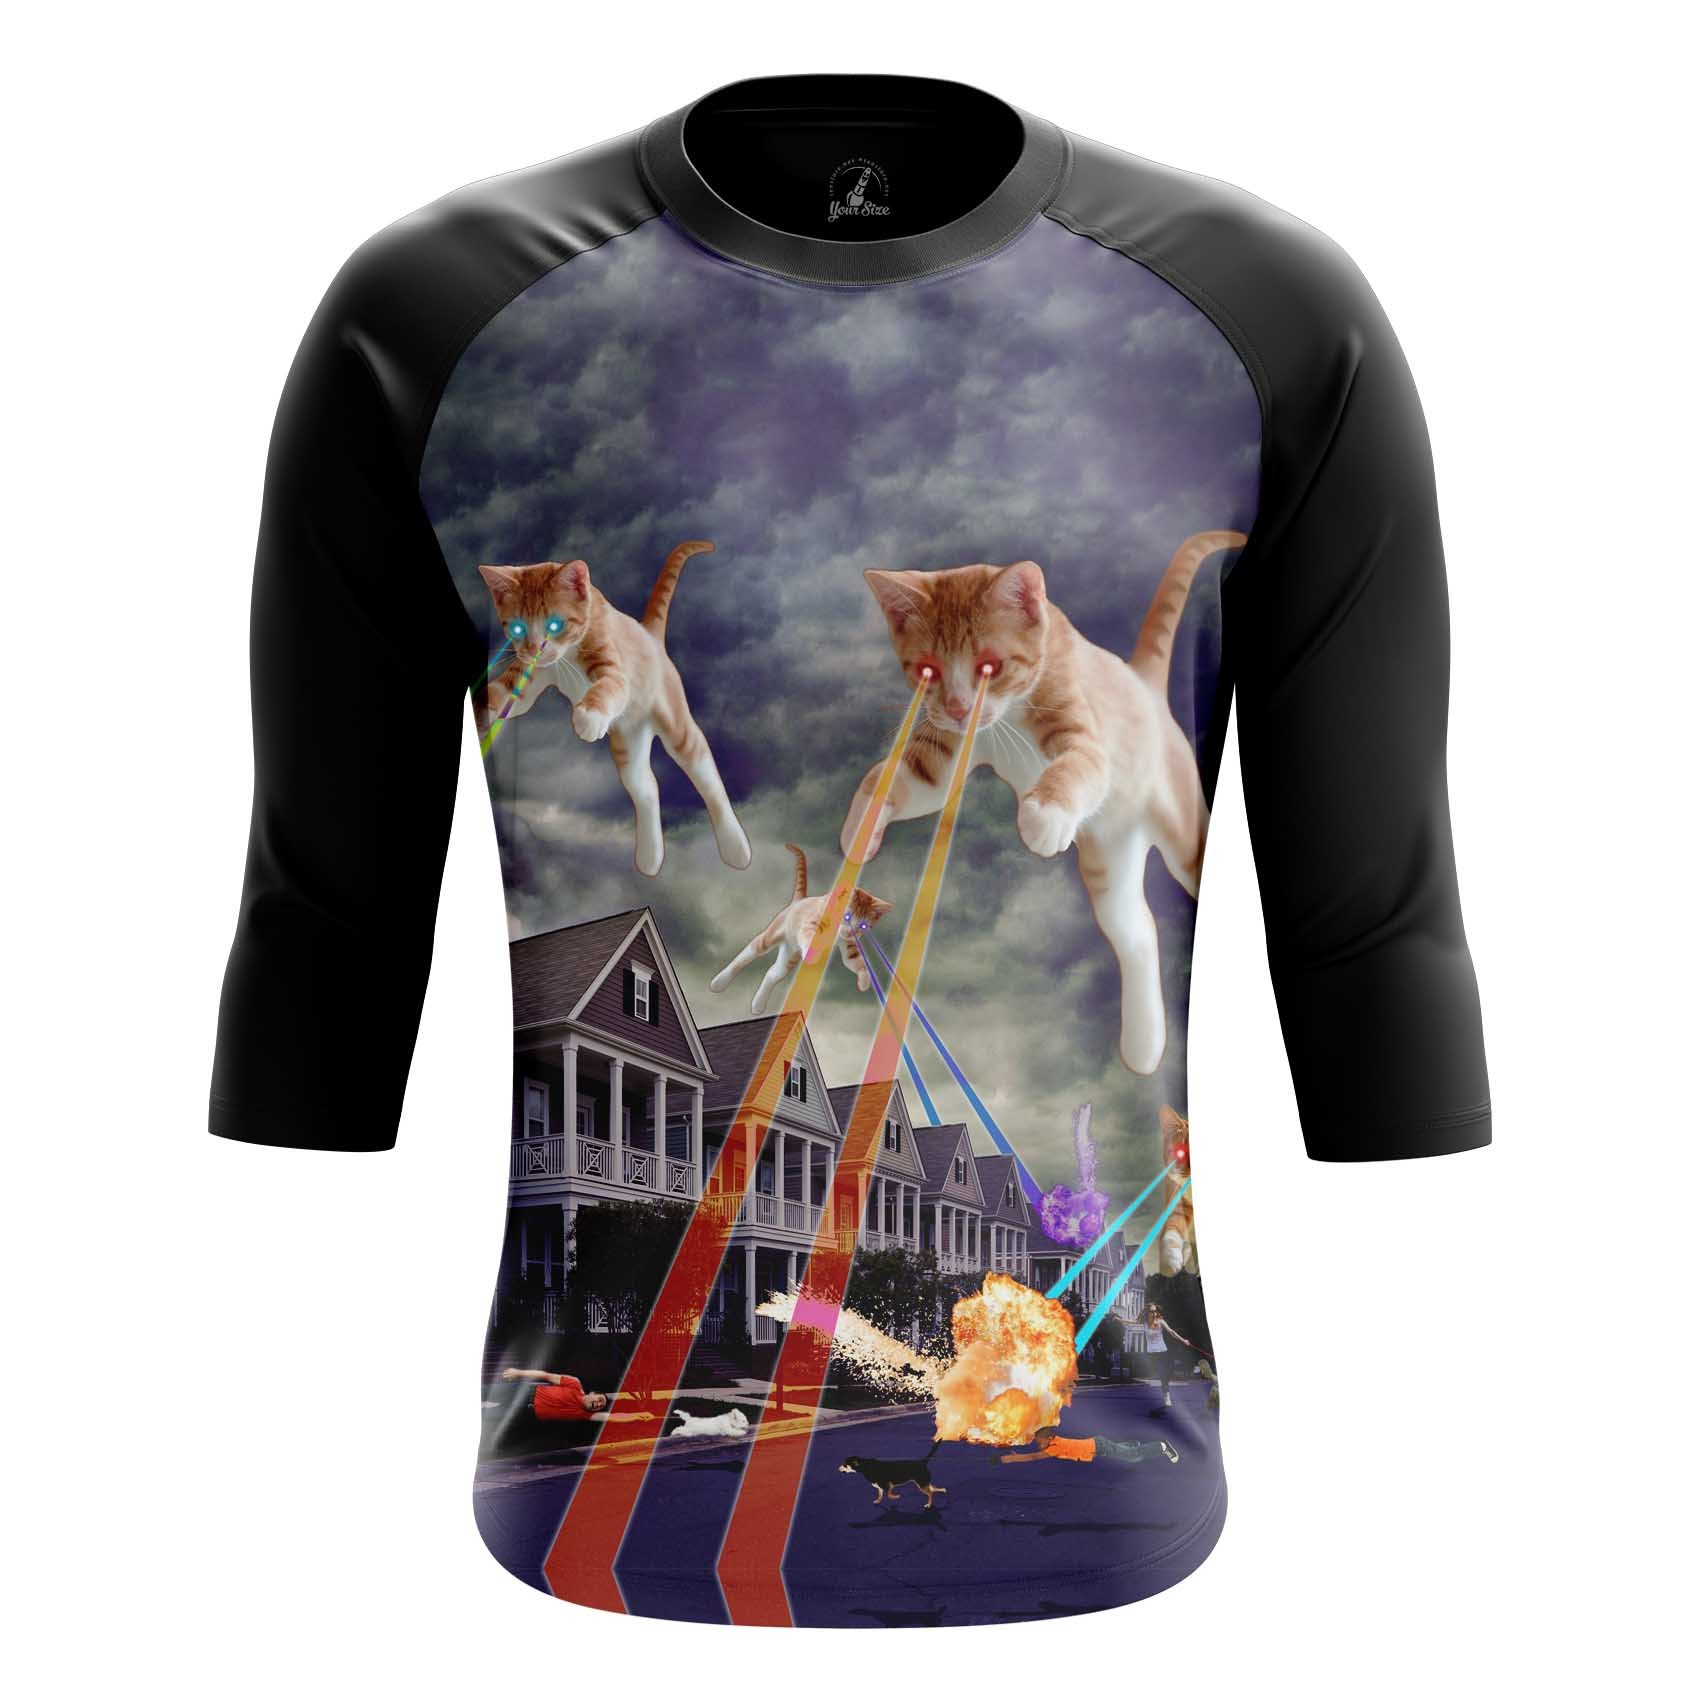 Collectibles Men'S T-Shirt Cat Invasion Fun Kittens